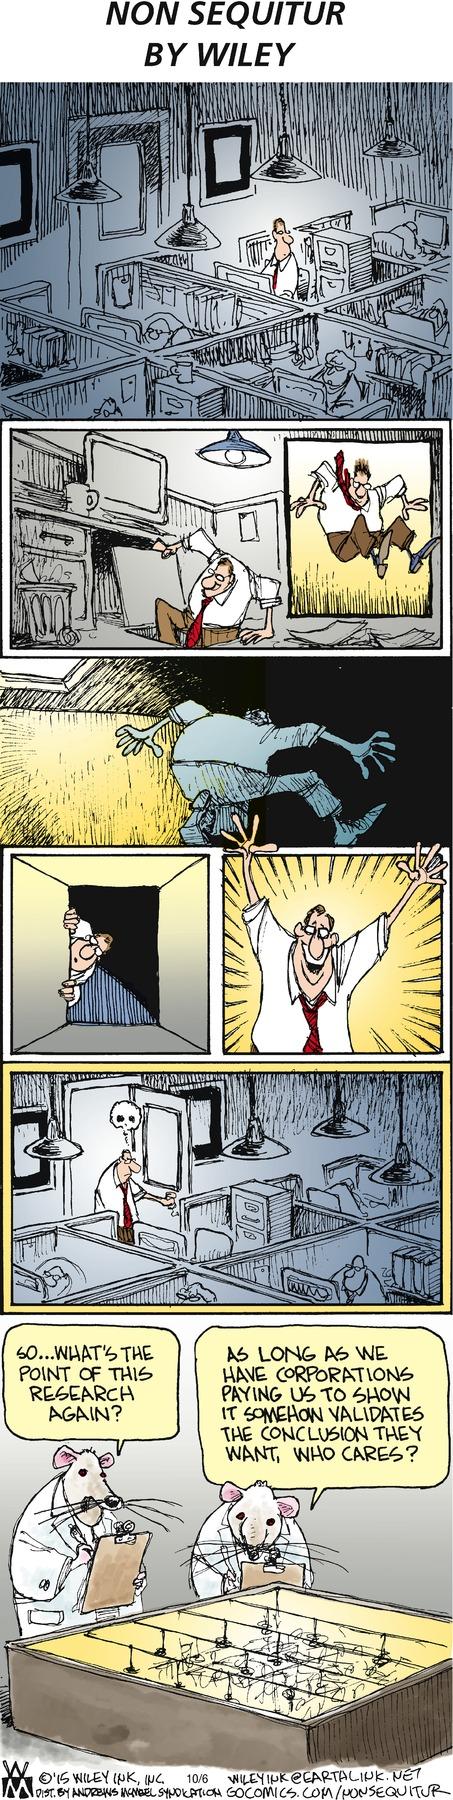 Non Sequitur Comic Strip for October 06, 2019